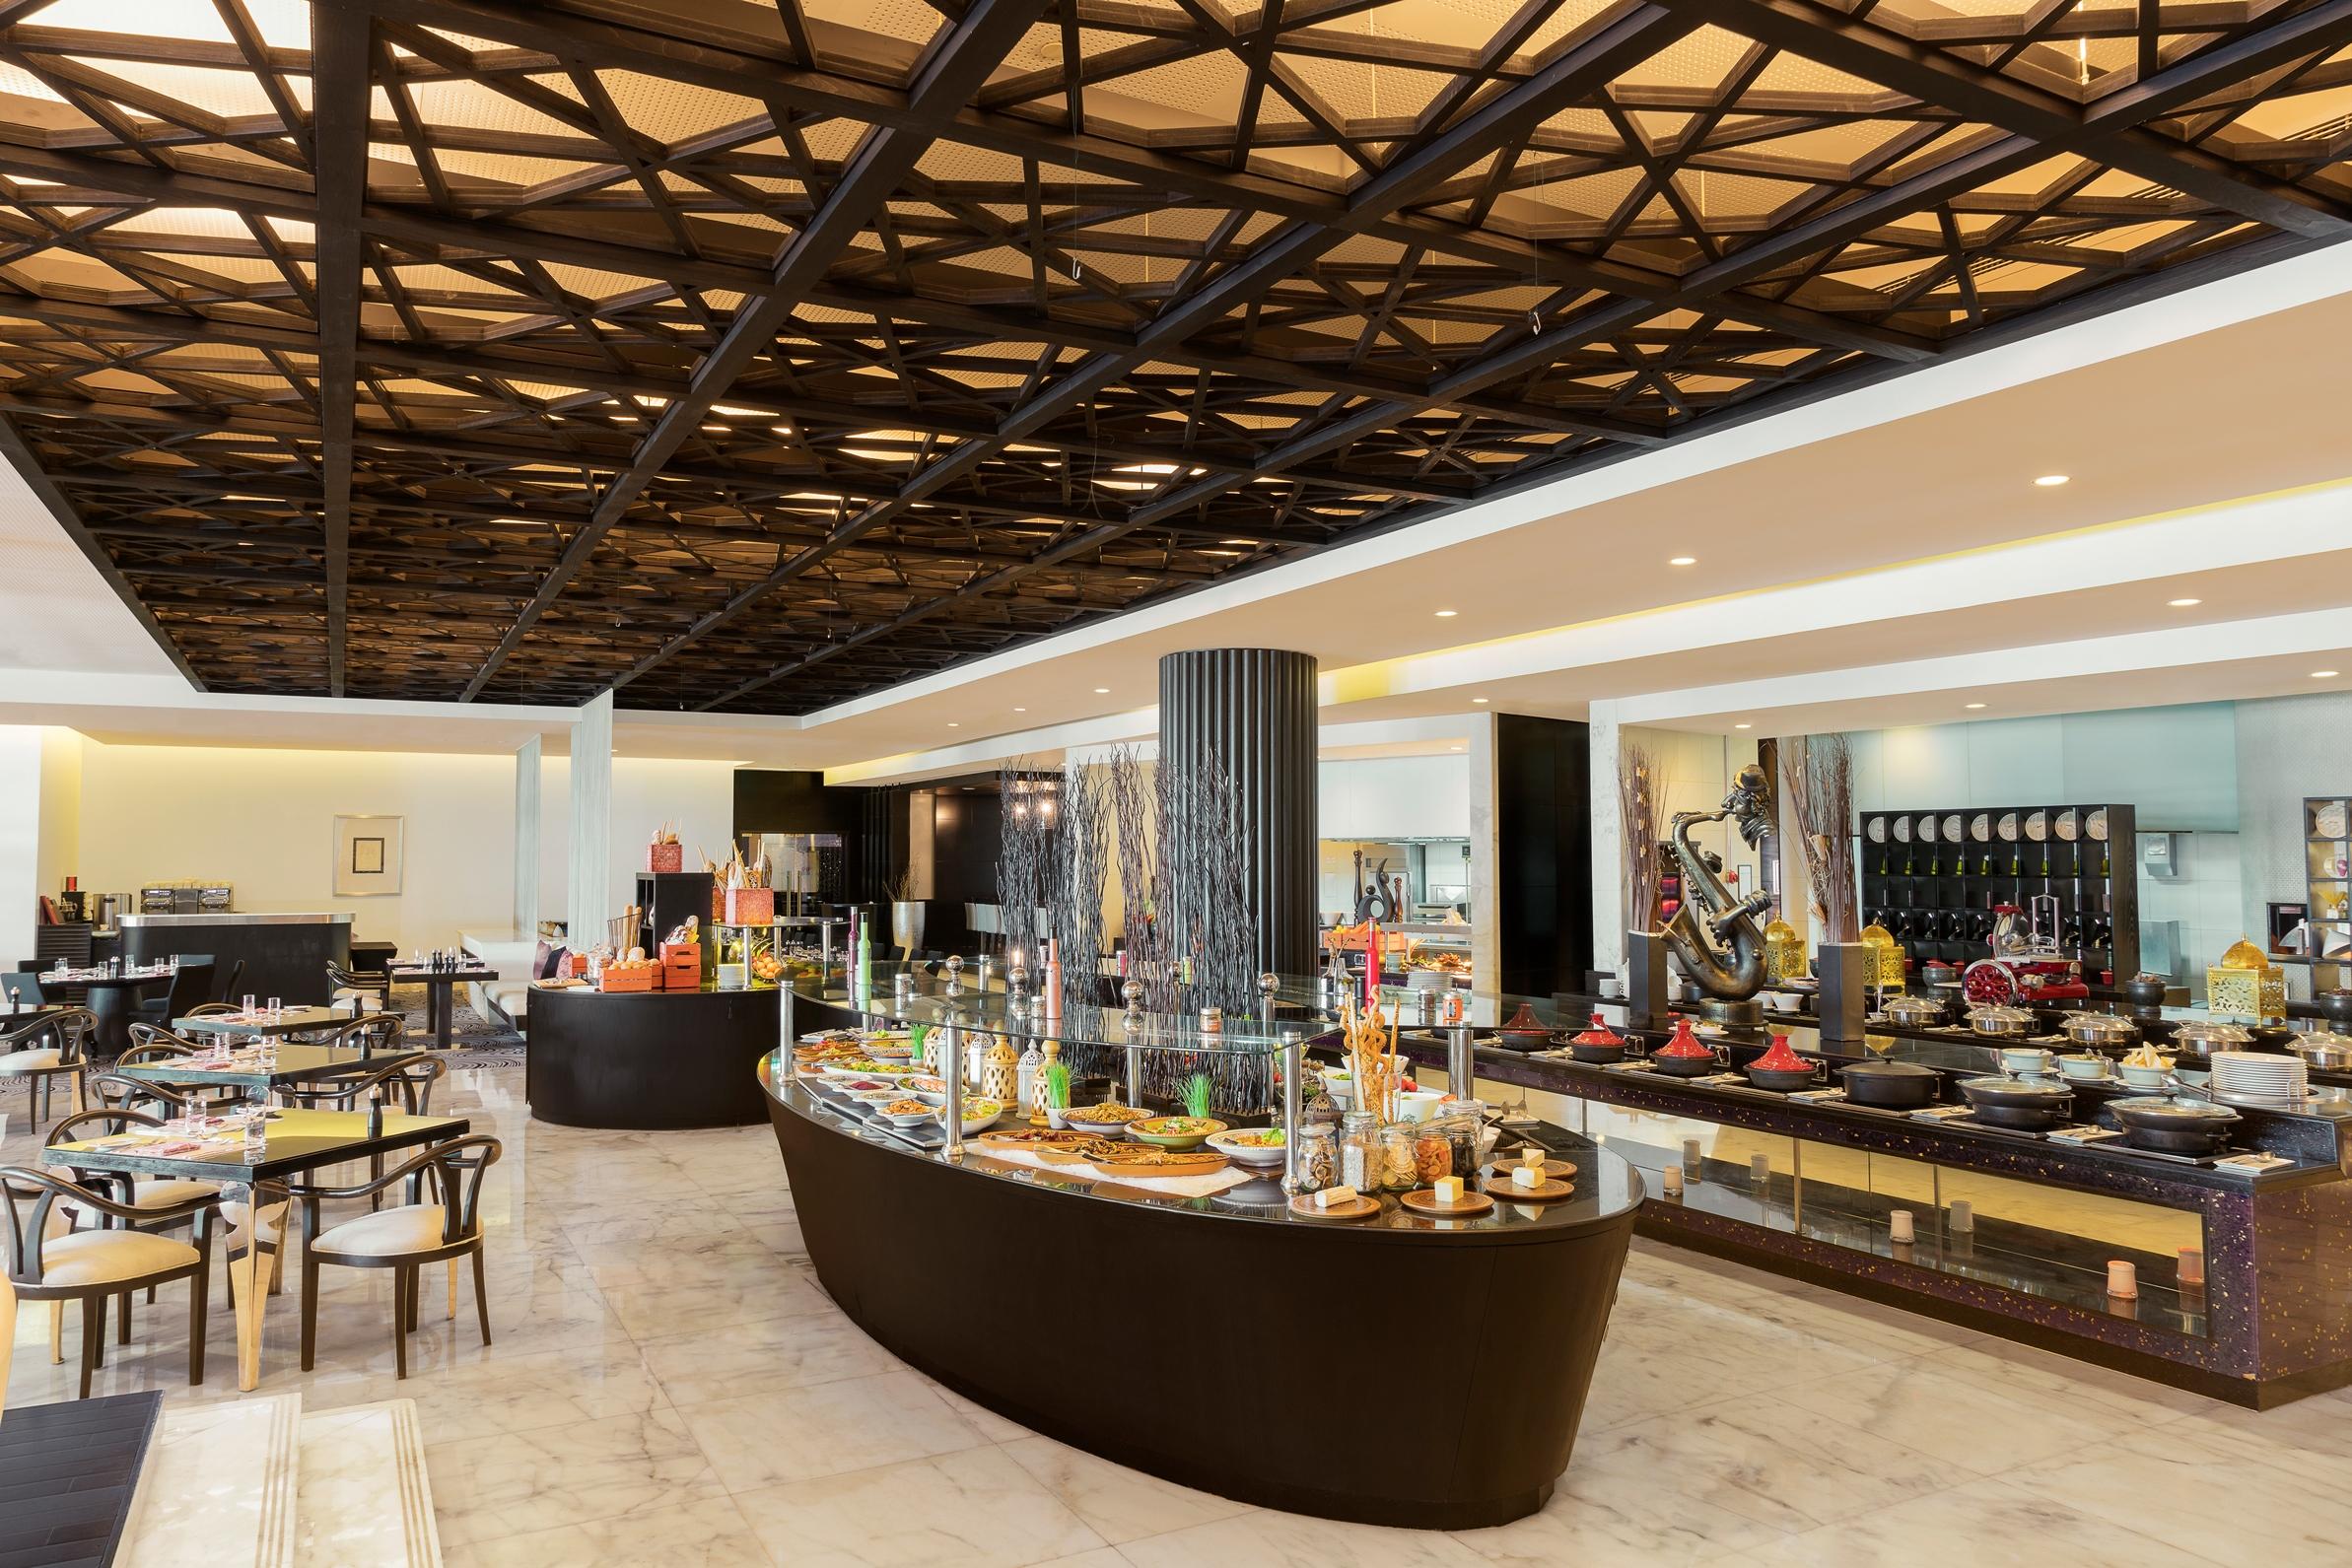 Sofitel Abu Dhabi Corniche Restaurant Bar